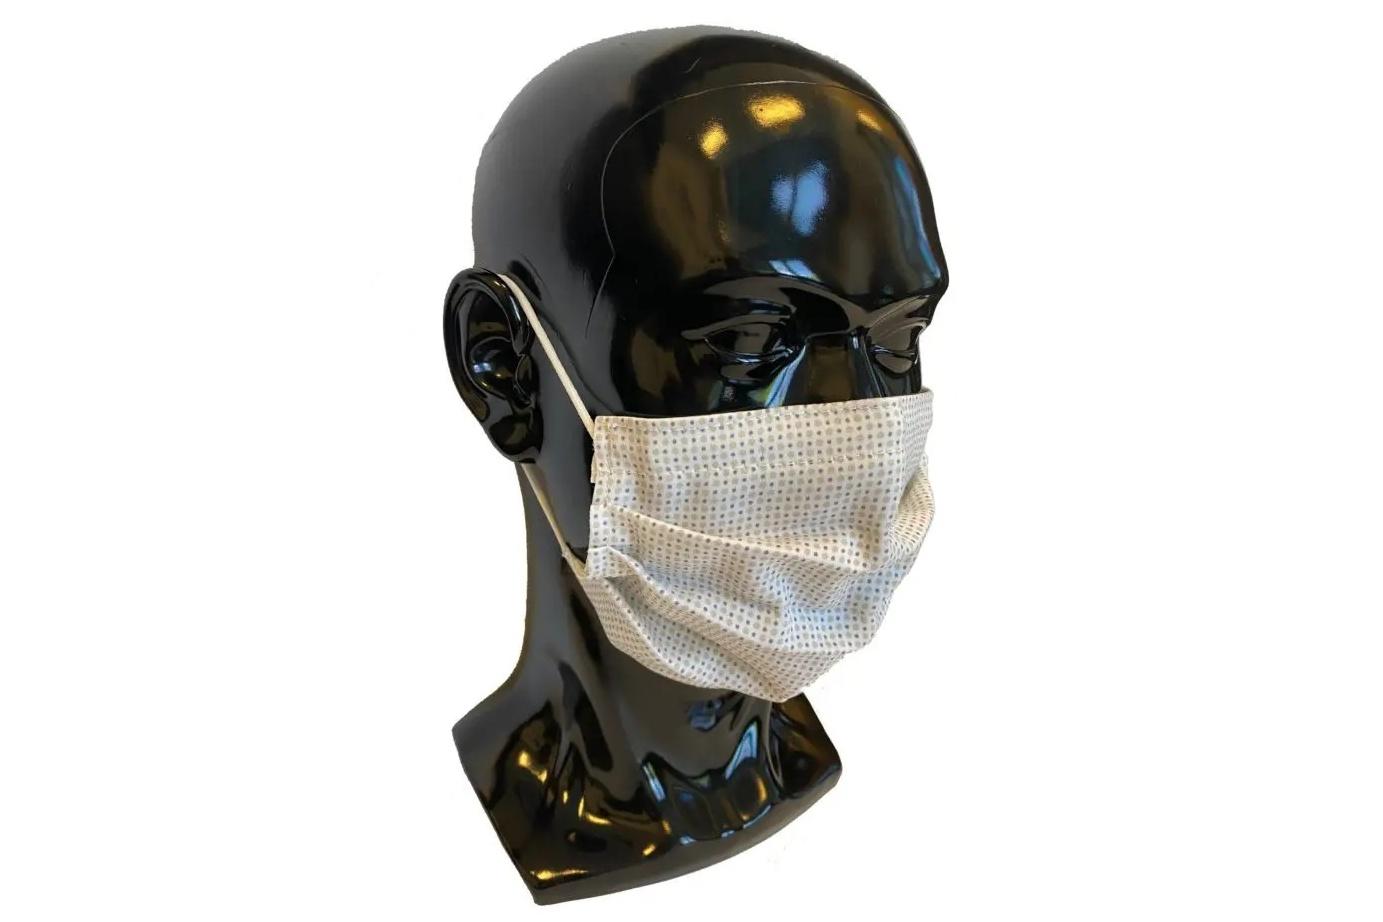 Máscara feita de tecido com pontos de prata elementar e zinco. (Fonte: Indianapolis Monthly)